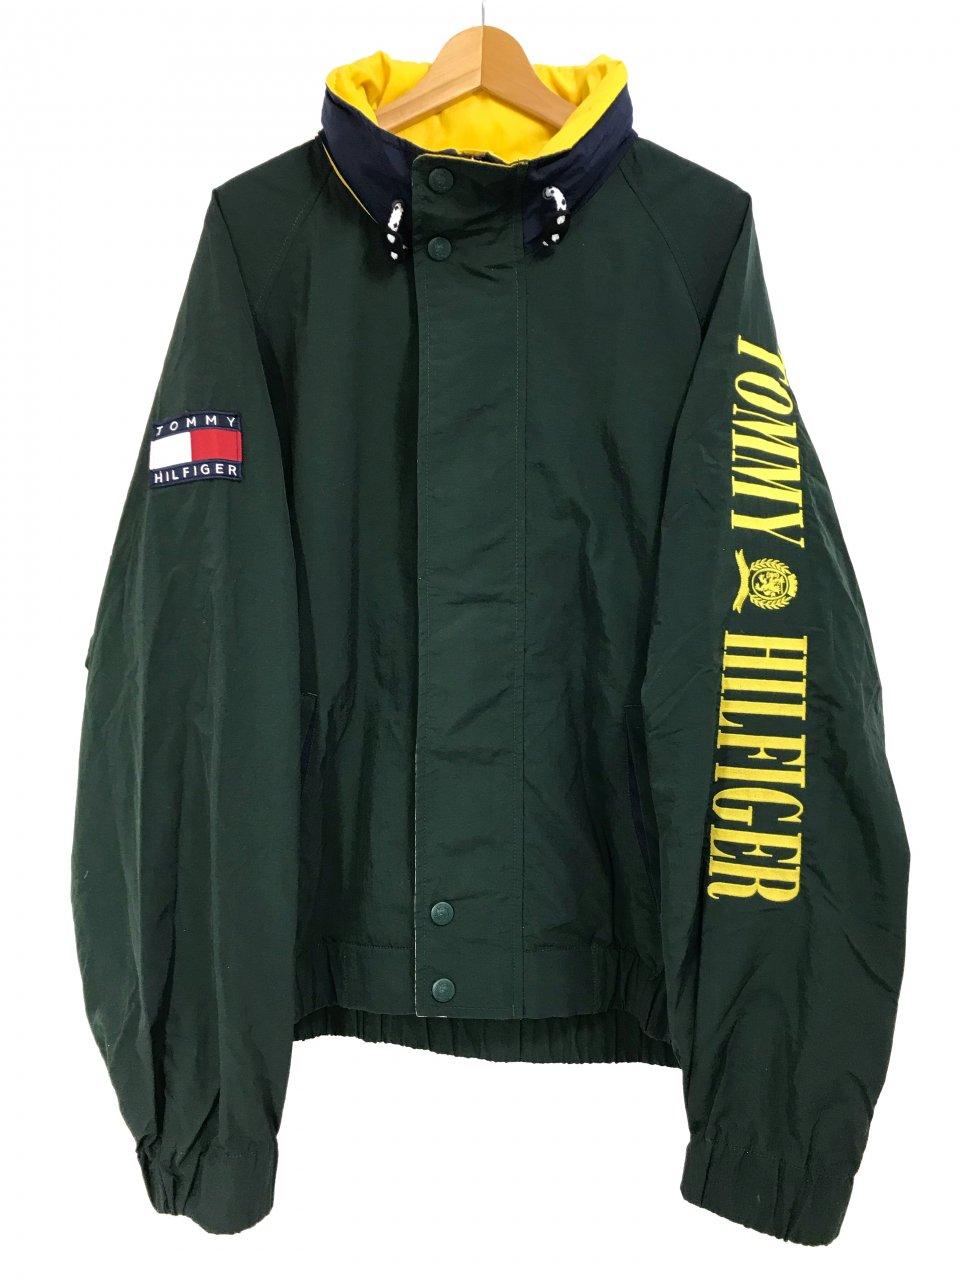 vintage 90s PUMA Jacke retro oldschool braun jacket 90er M Sportjacke Skisport & Snowboarding